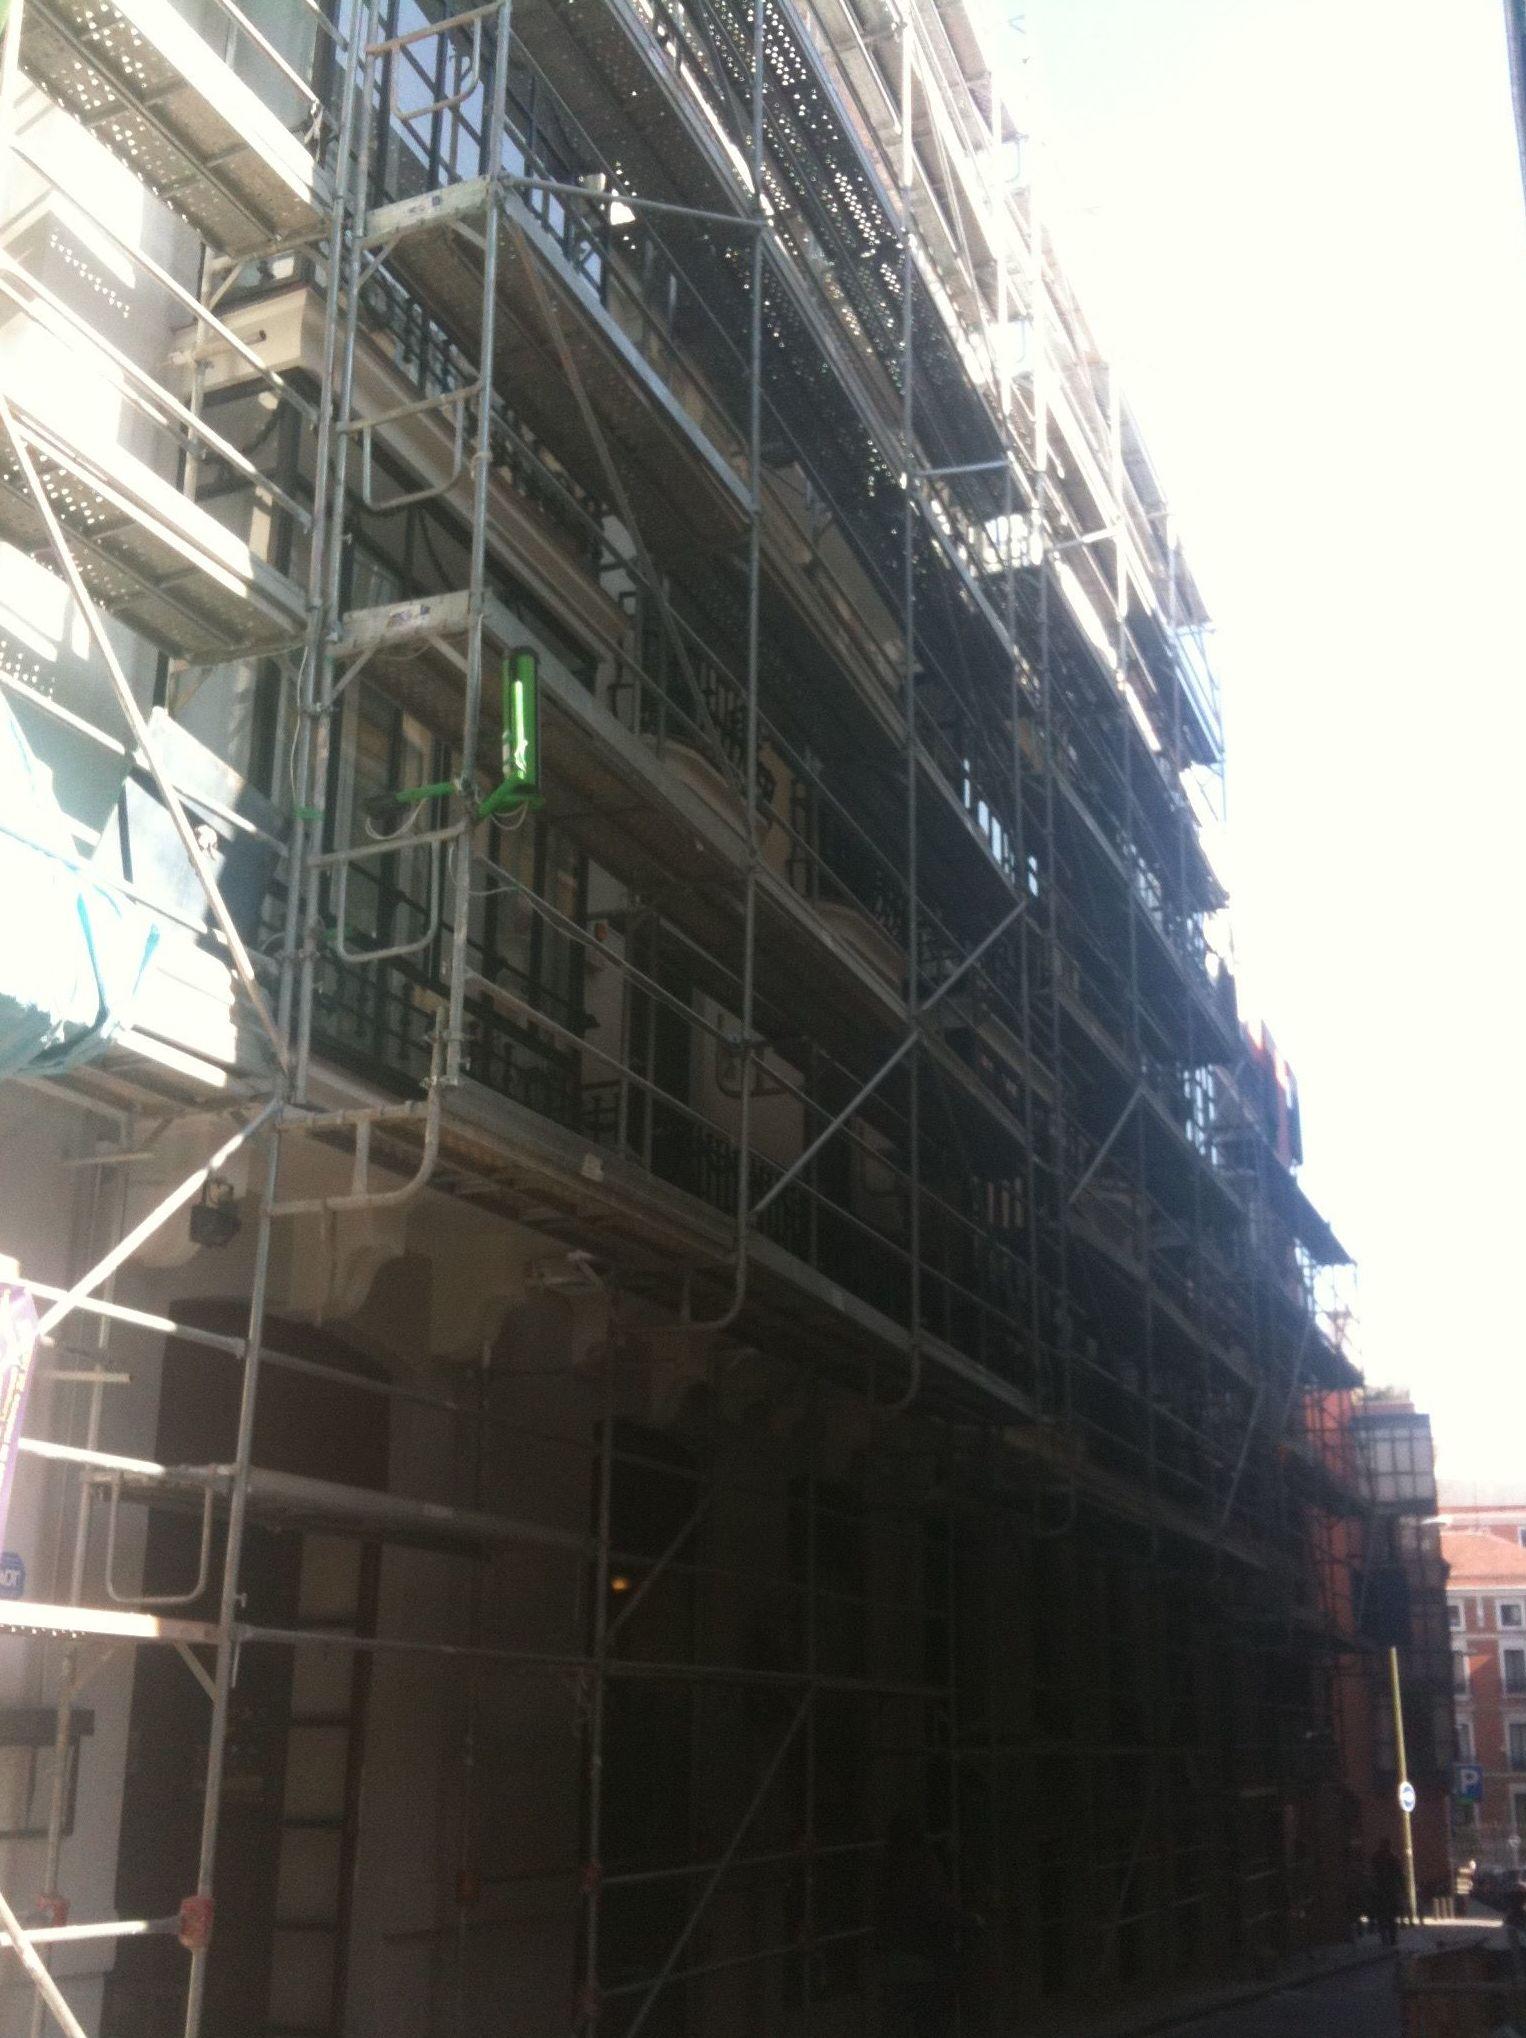 Andamios para rehabilitación de fachadas en Madrid